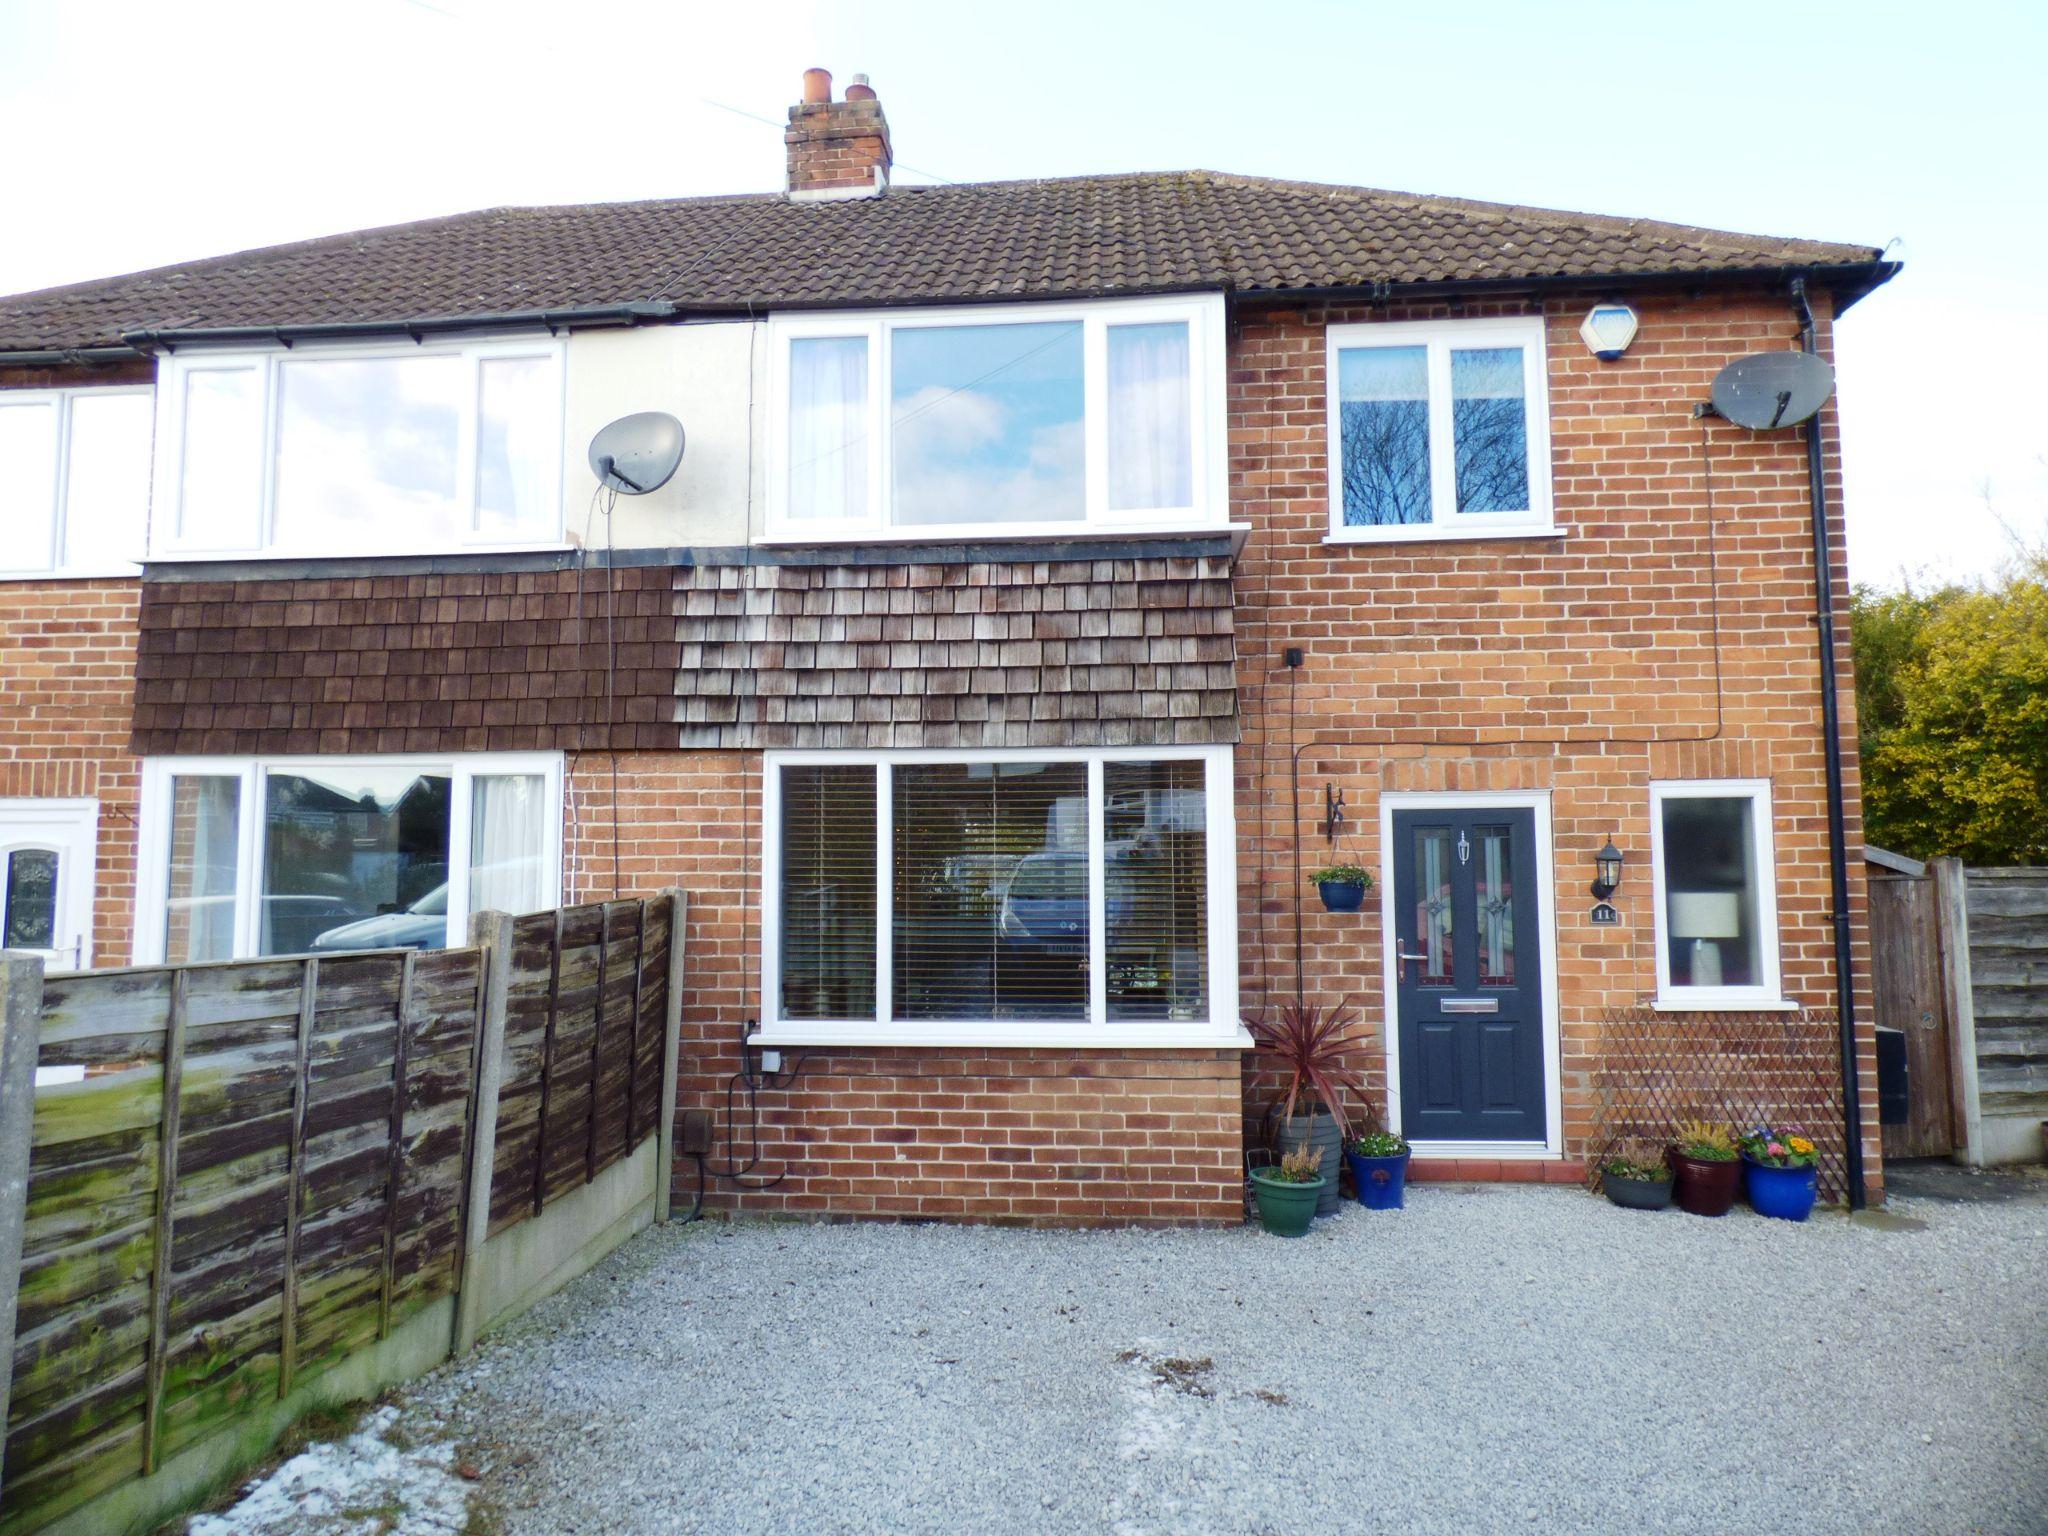 3 Bedroom Semi-detached House For Sale - Front External